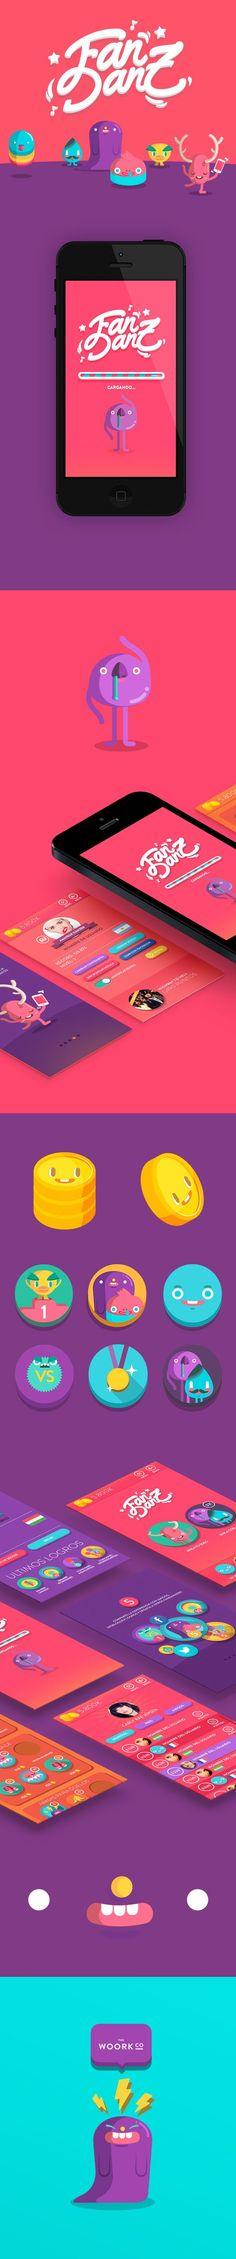 Fandanz App on Character Design Served